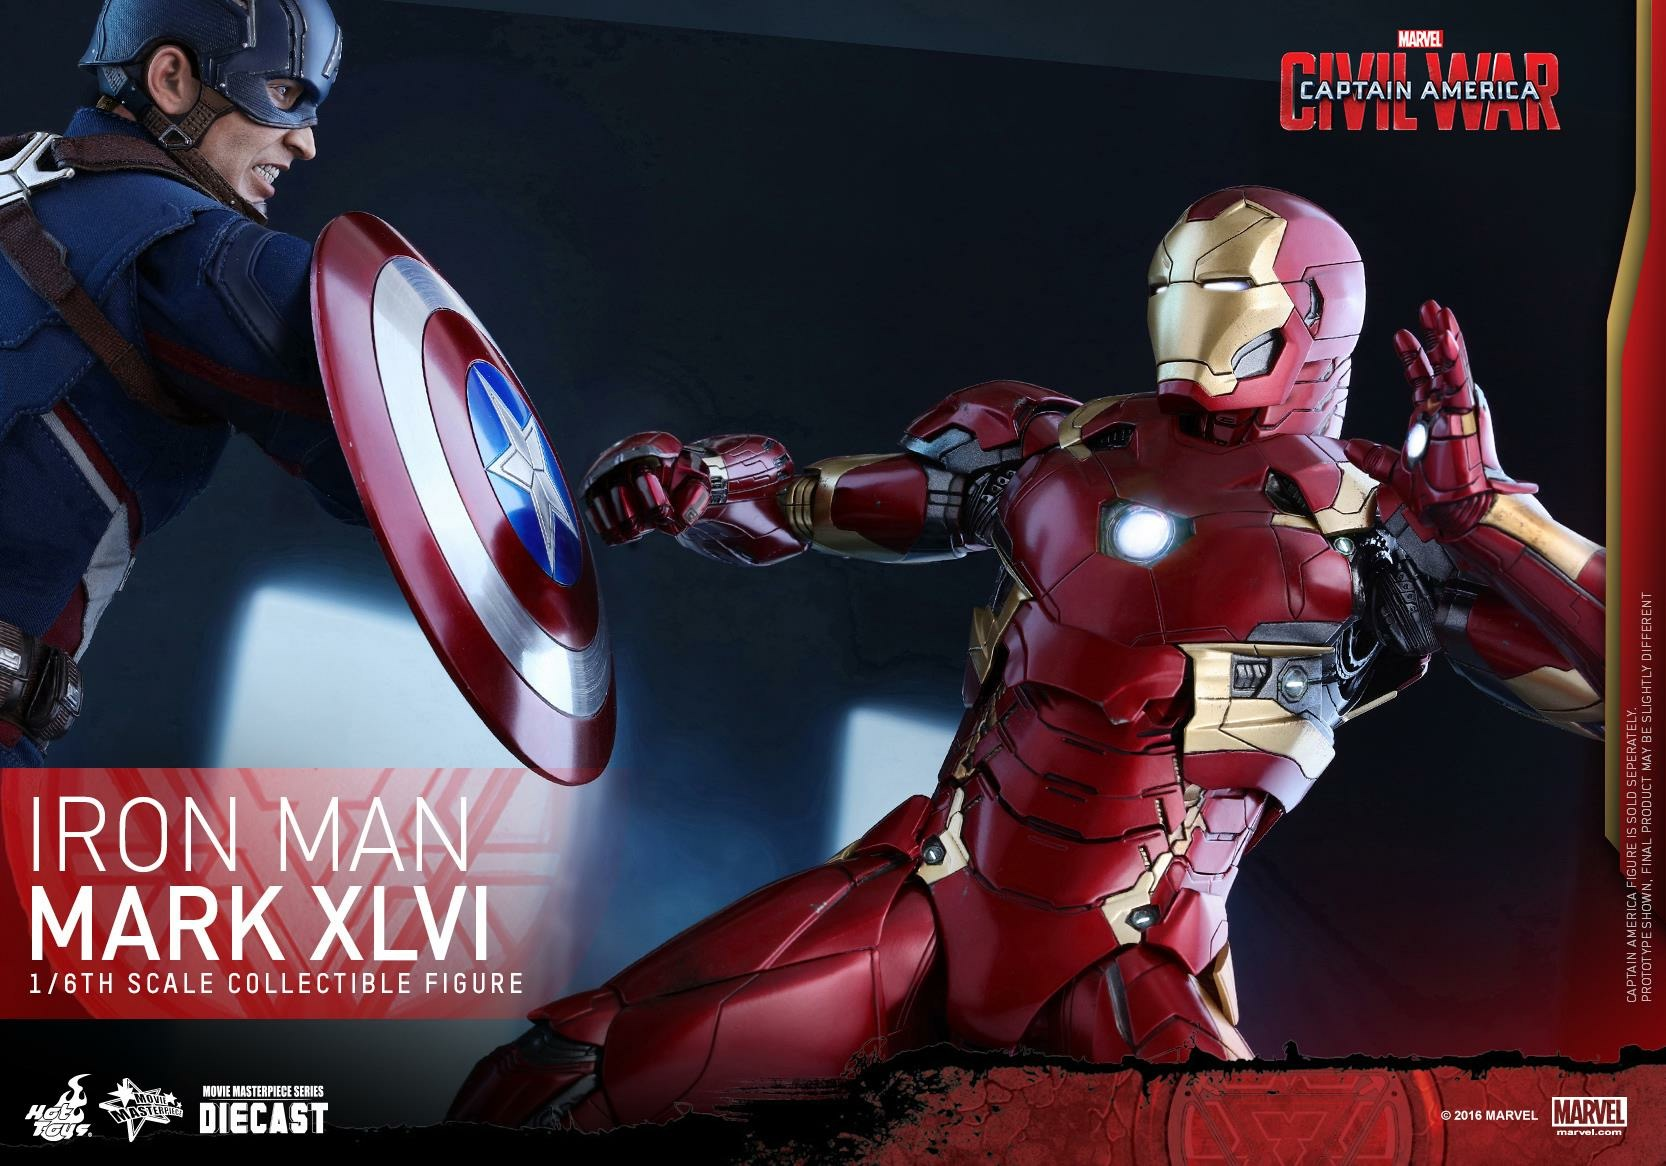 CAPTAIN AMERICA : CIVIL WAR - IRON MAN MARK XLVI (MMS353DC16) 160419024014889267